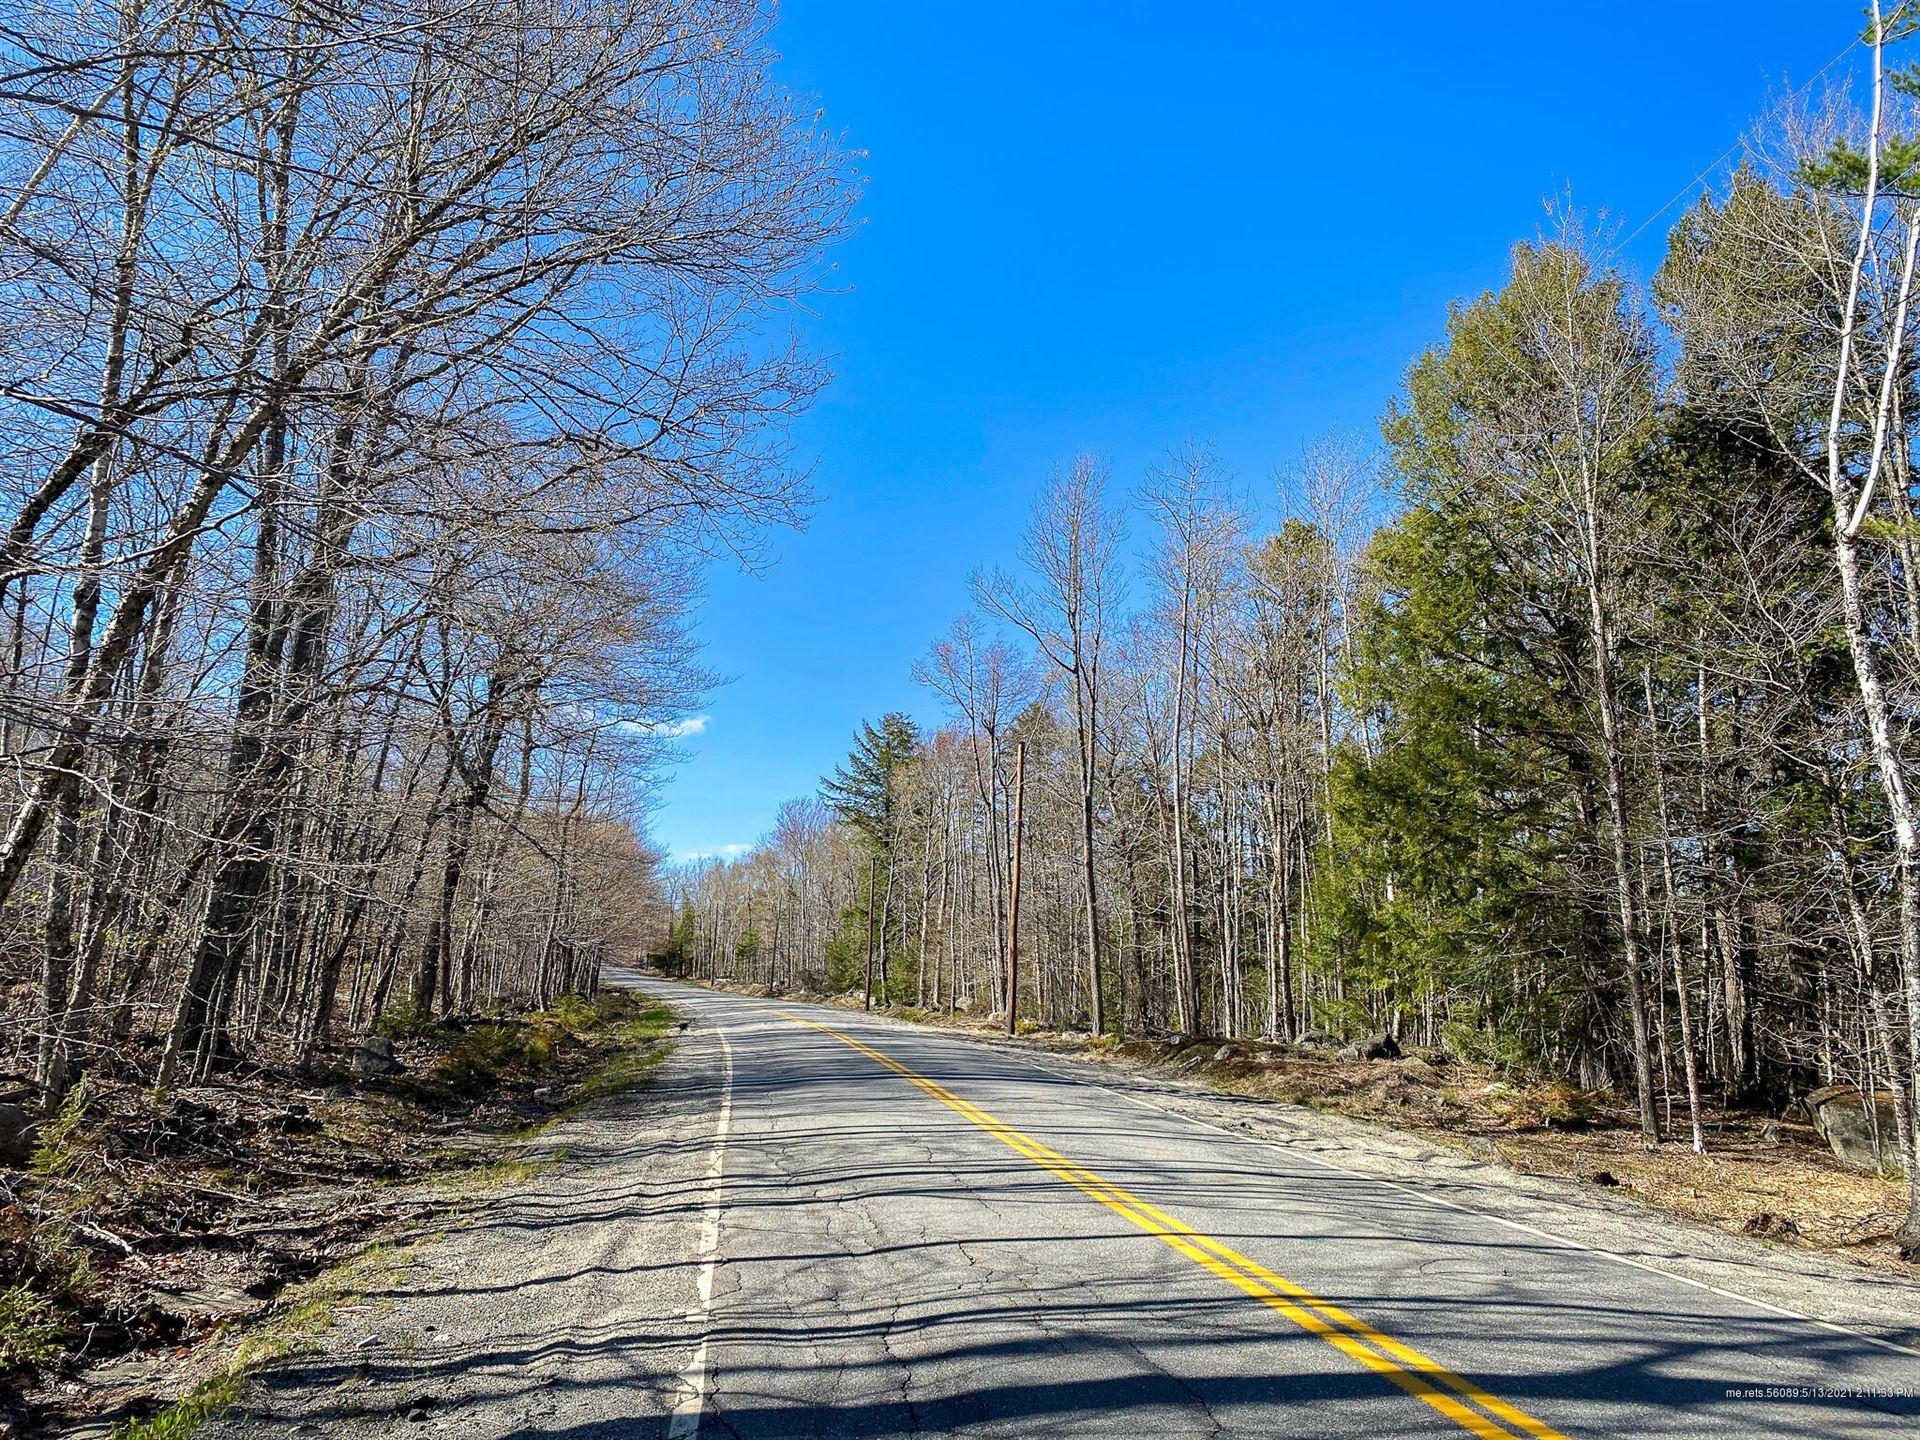 Photo of 1539 Otis Road, Otis, ME 04605 (MLS # 1491450)